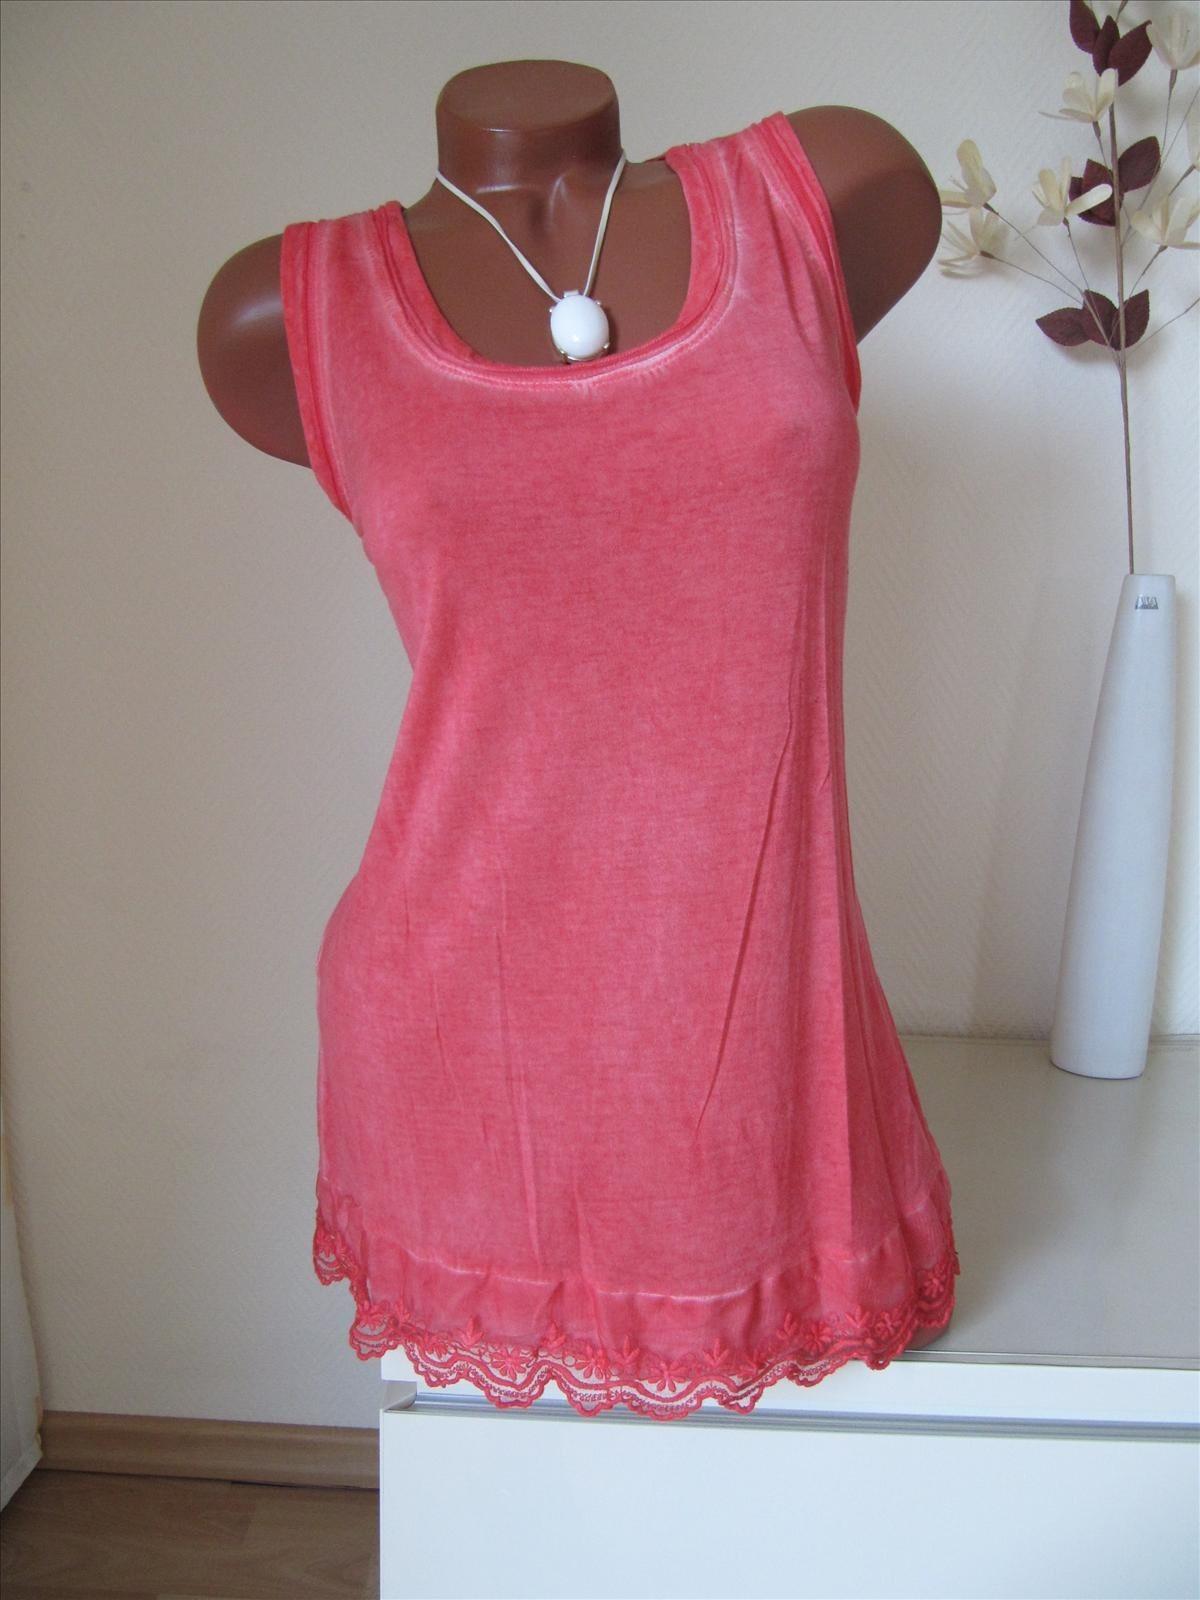 Kreativ Kleid 42 GalerieAbend Elegant Kleid 42 Boutique